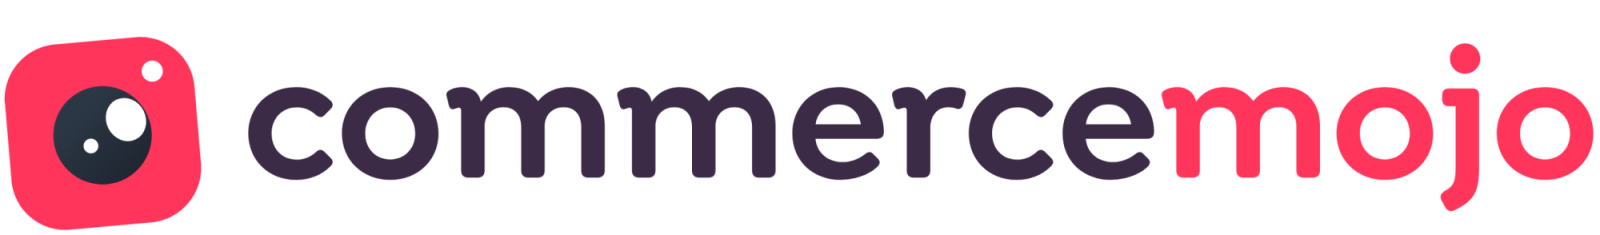 CommerceMojo-review